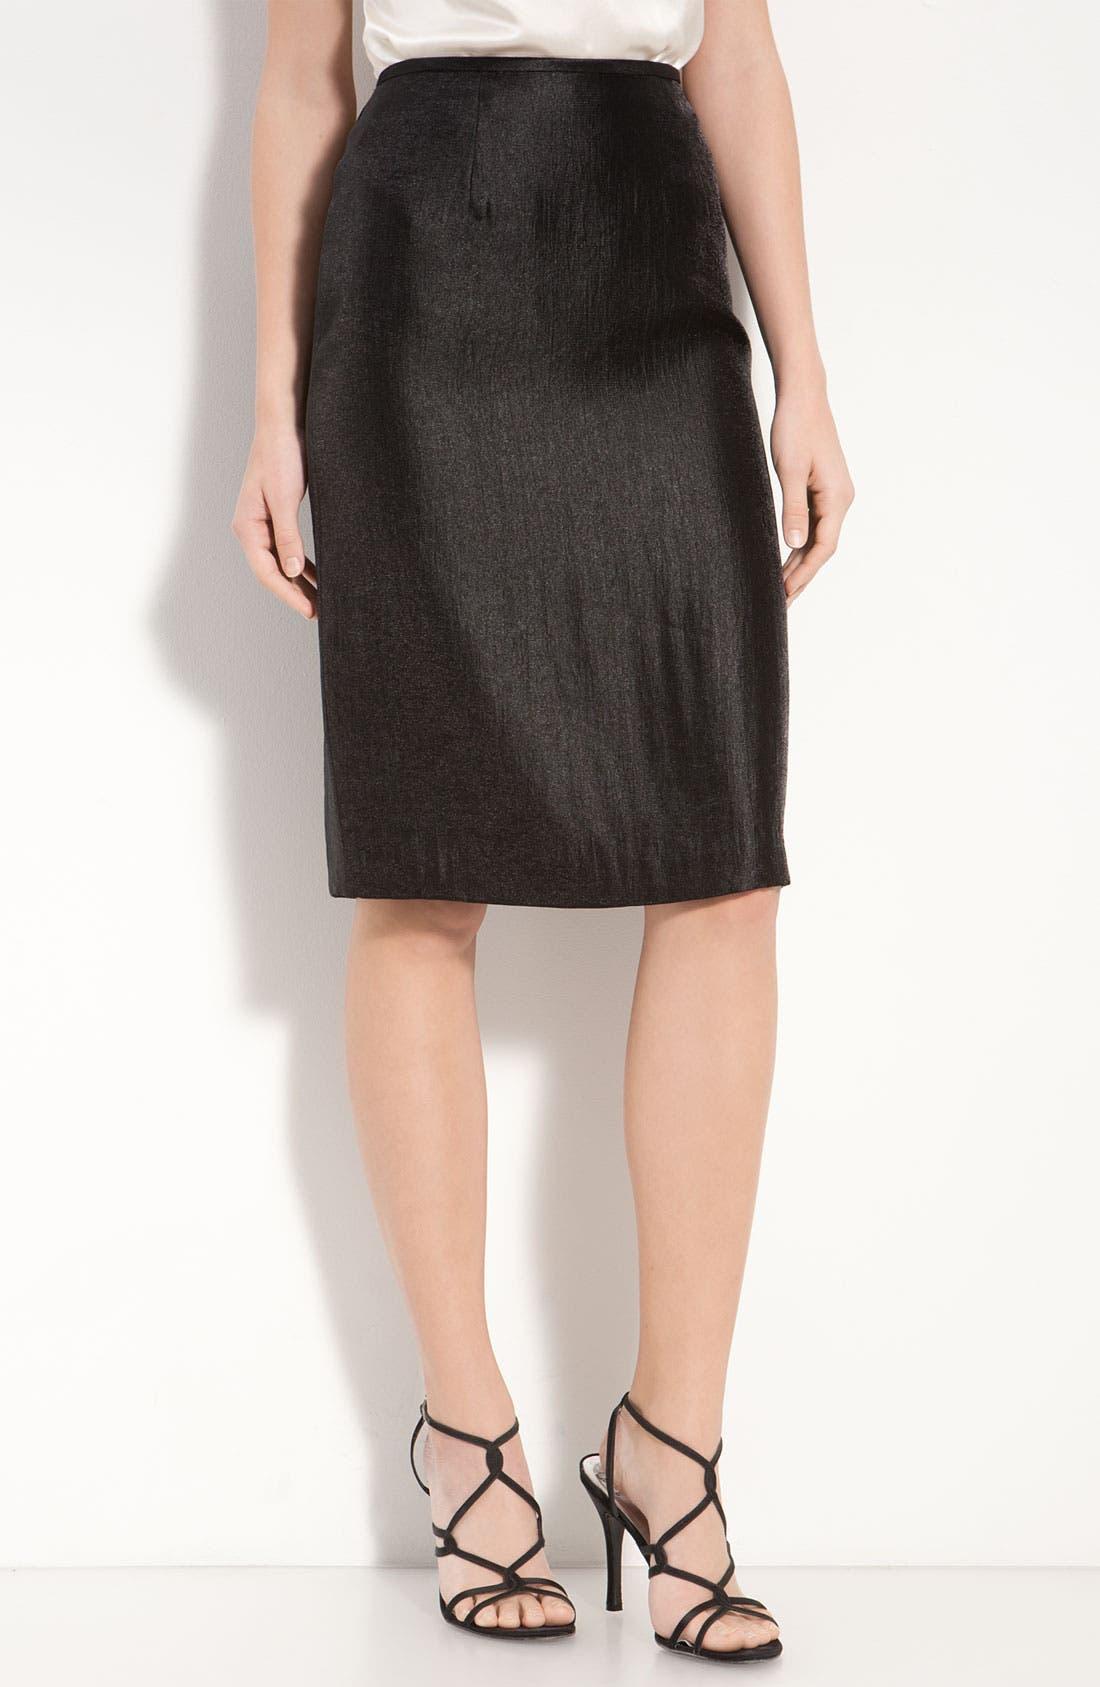 Alternate Image 1 Selected - Adrianna Papell Metallic Pencil Skirt